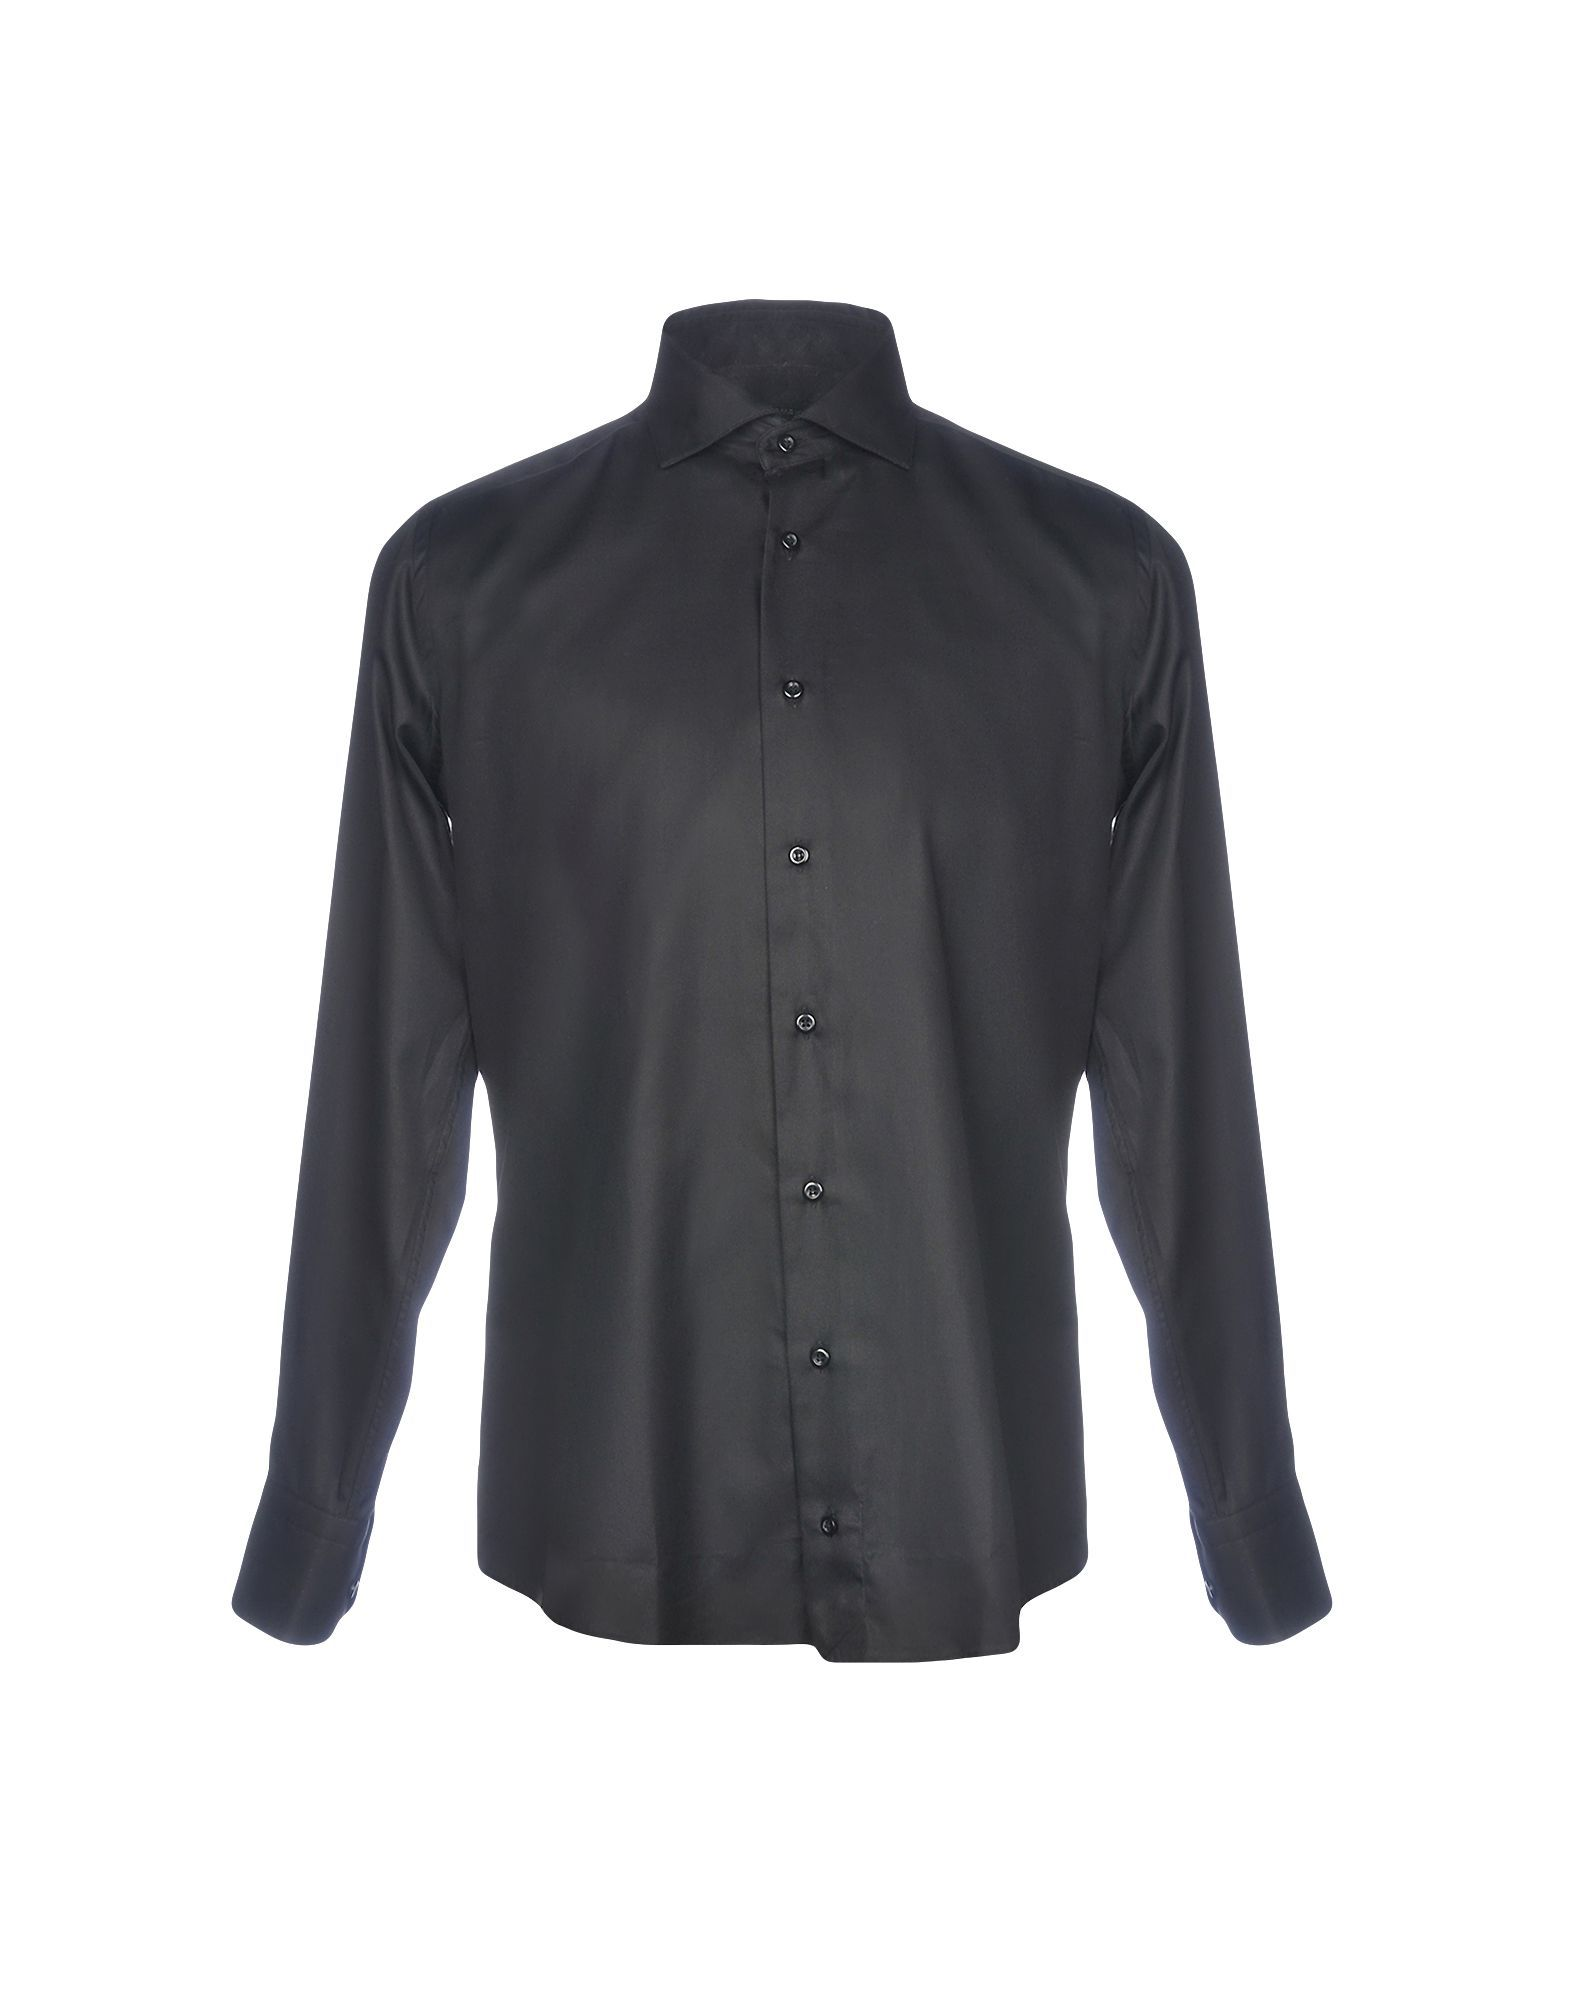 Hamaki-Ho Black Cotton Shirt